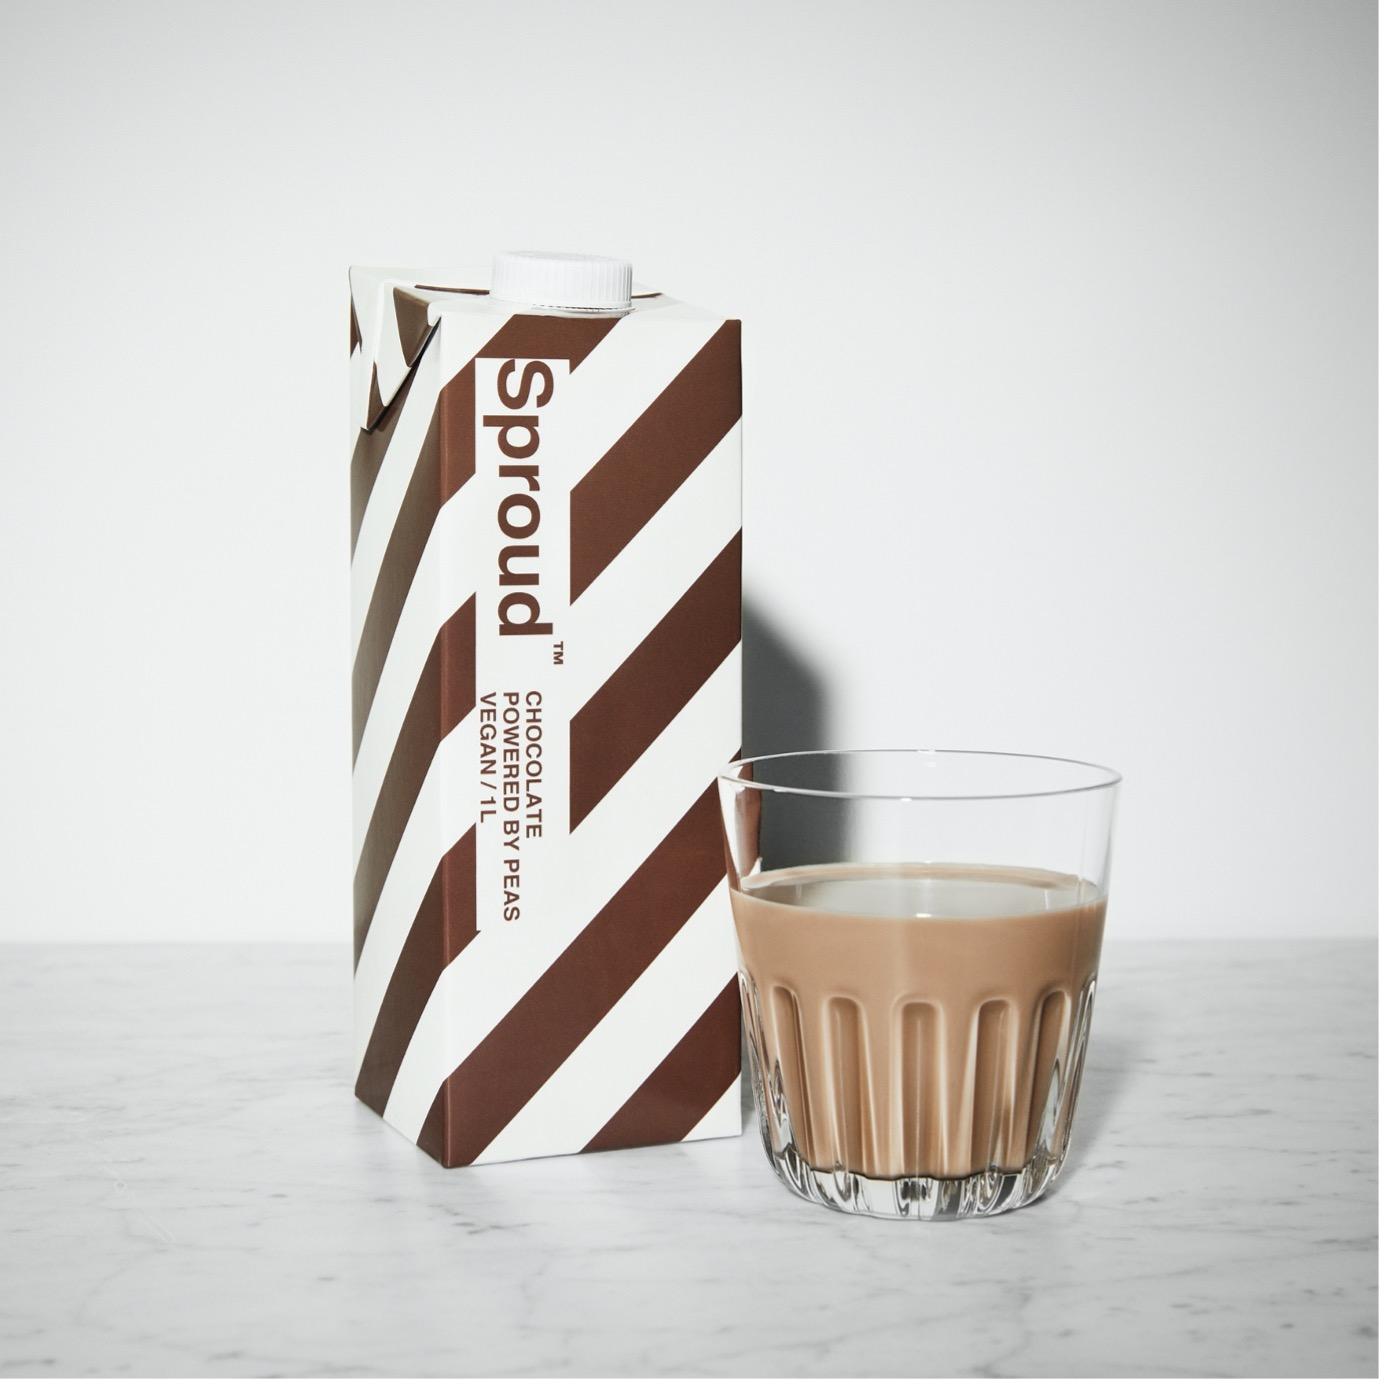 Sproud Chocolate